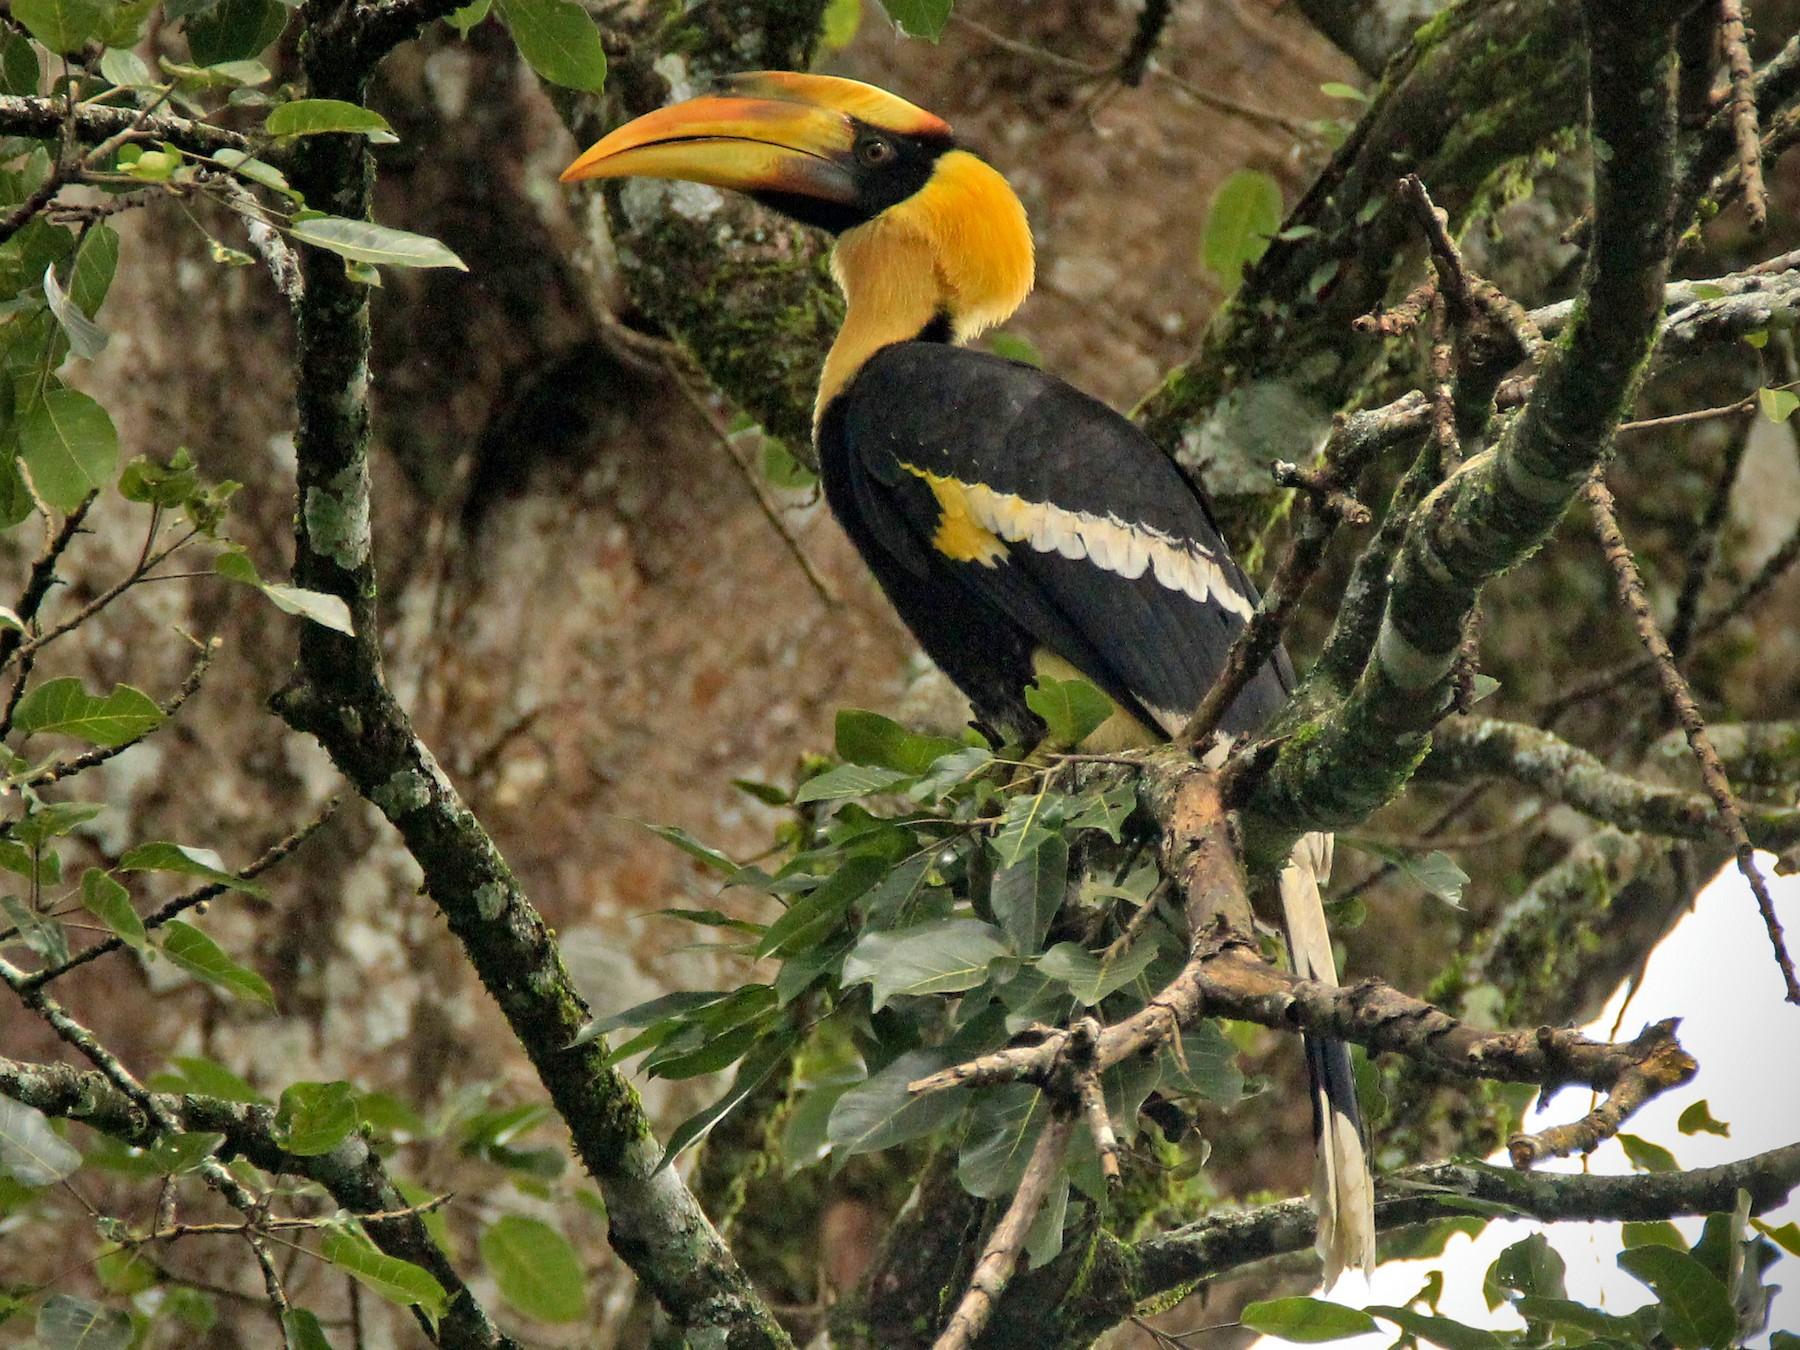 Great Hornbill - Vivek Sudhakaran